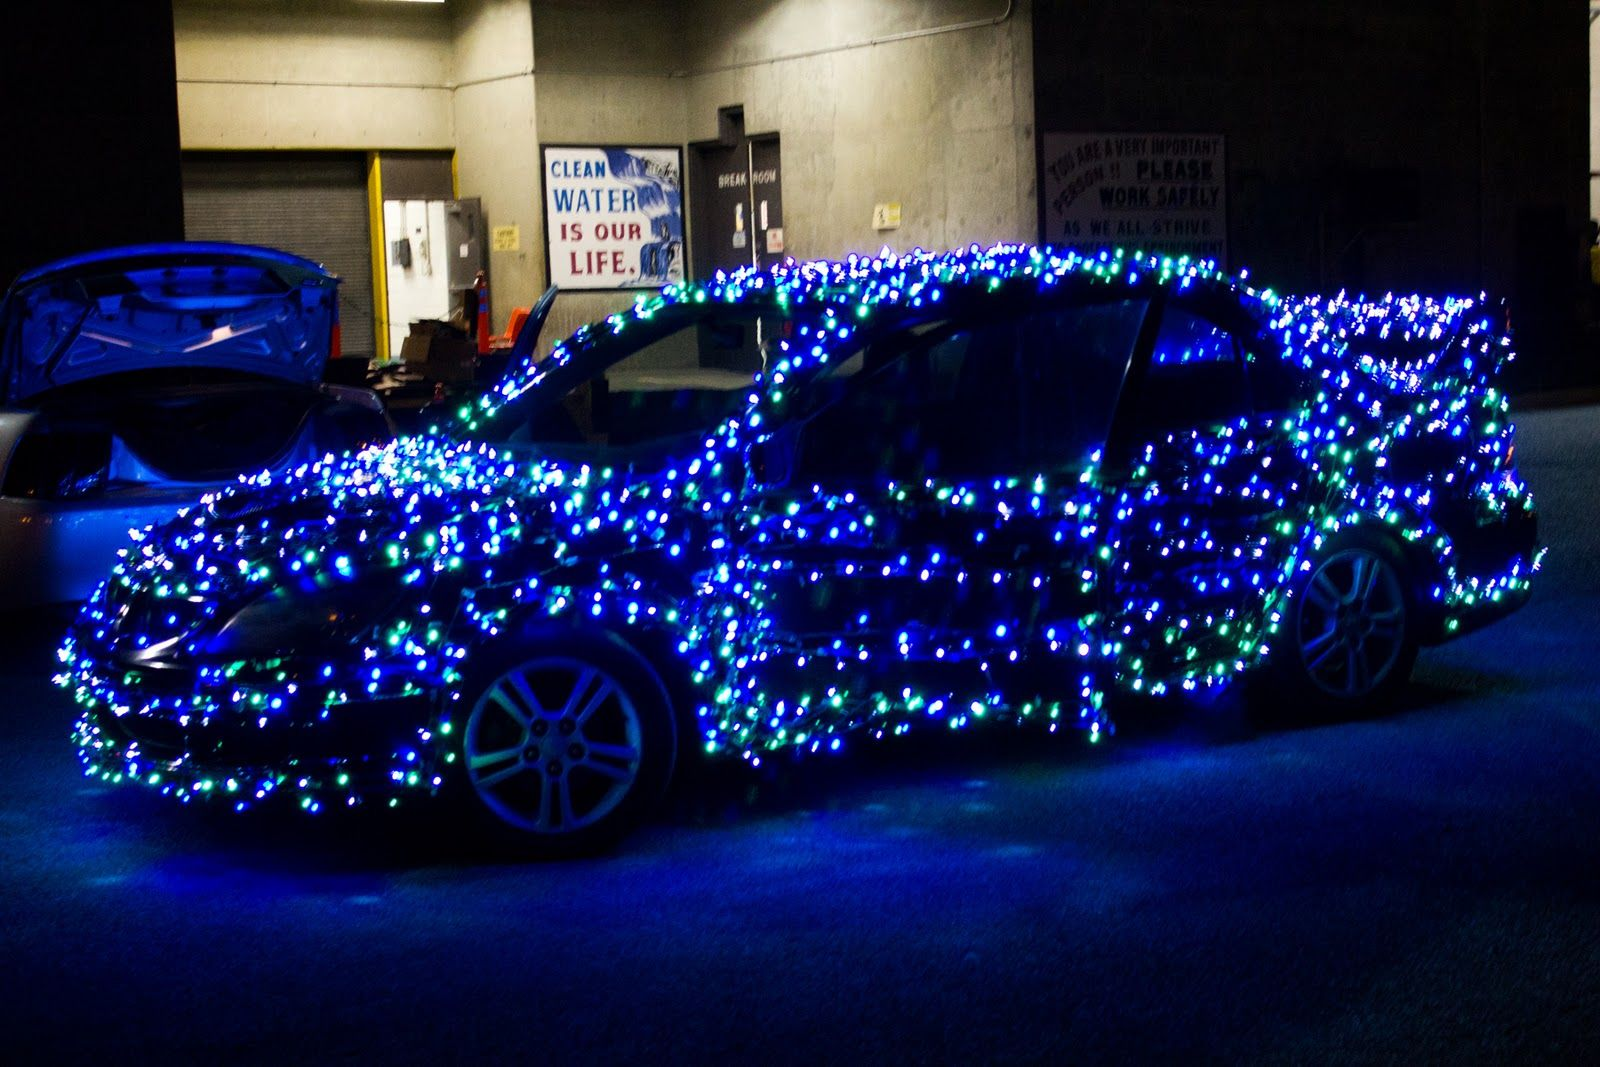 Enough Xmas Decorations Christmas Car Christmas Car Decorations Car Decor